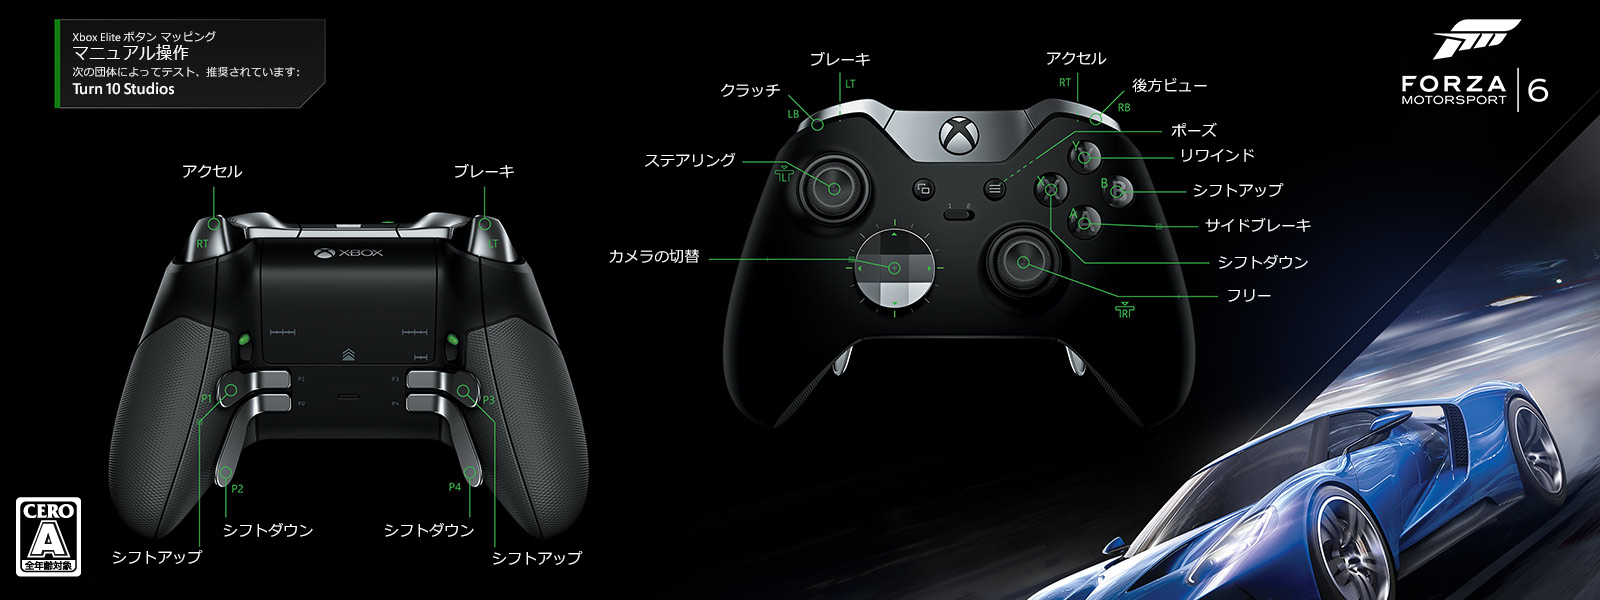 Forza Motorsport 6 - マニュアル トランスミッション Elite マッピング